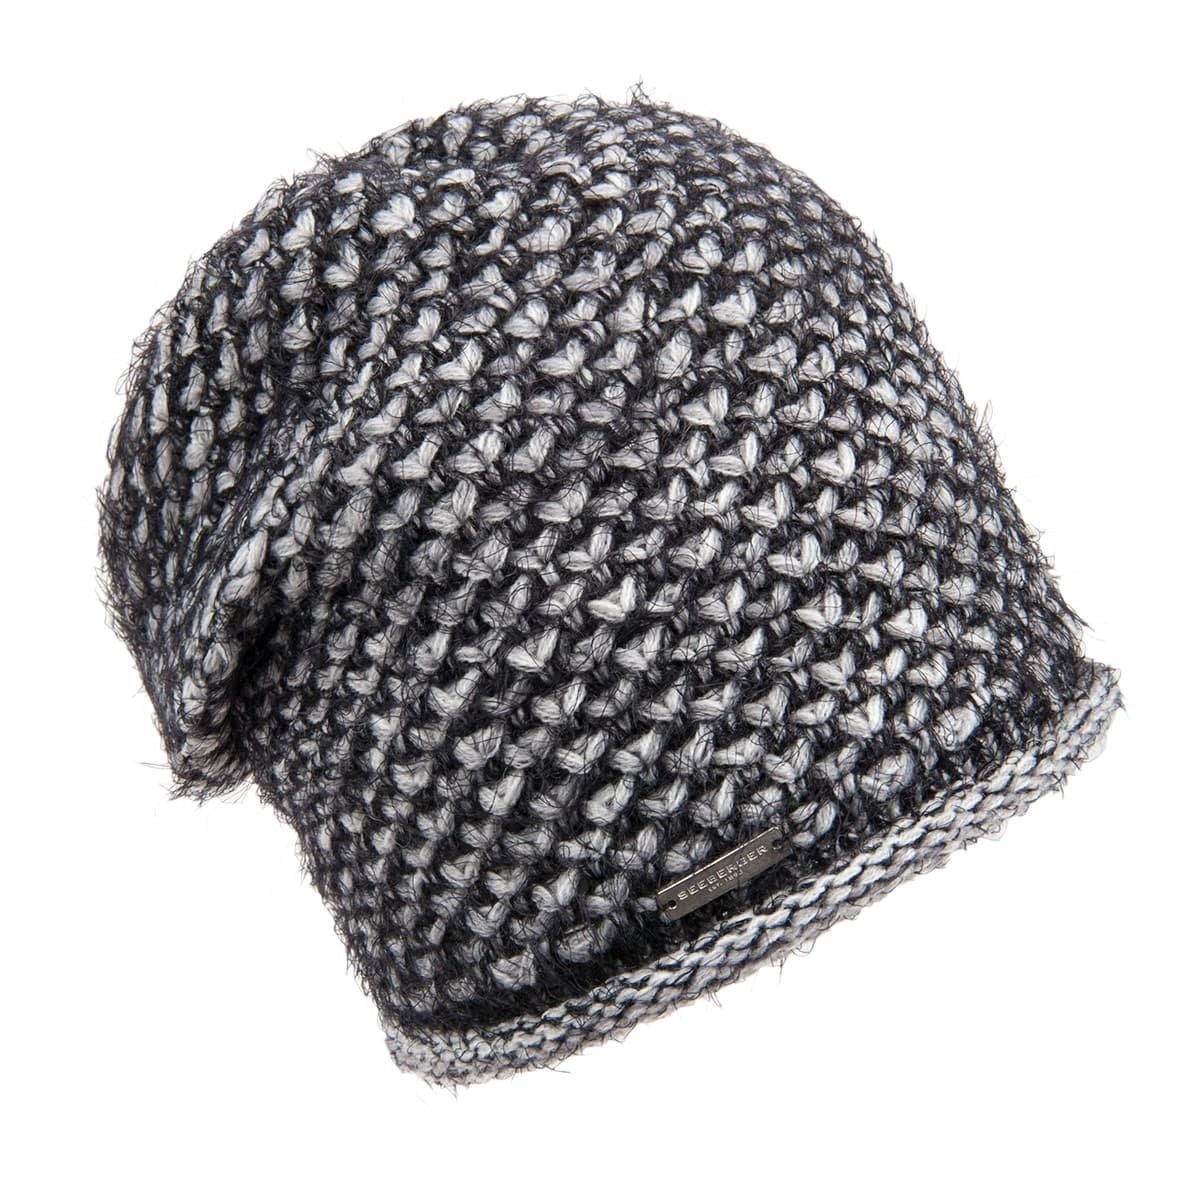 negozio dettagli per negozio online SEEBERGER | ladies headsock fancy and fluffy structure --> Online ...